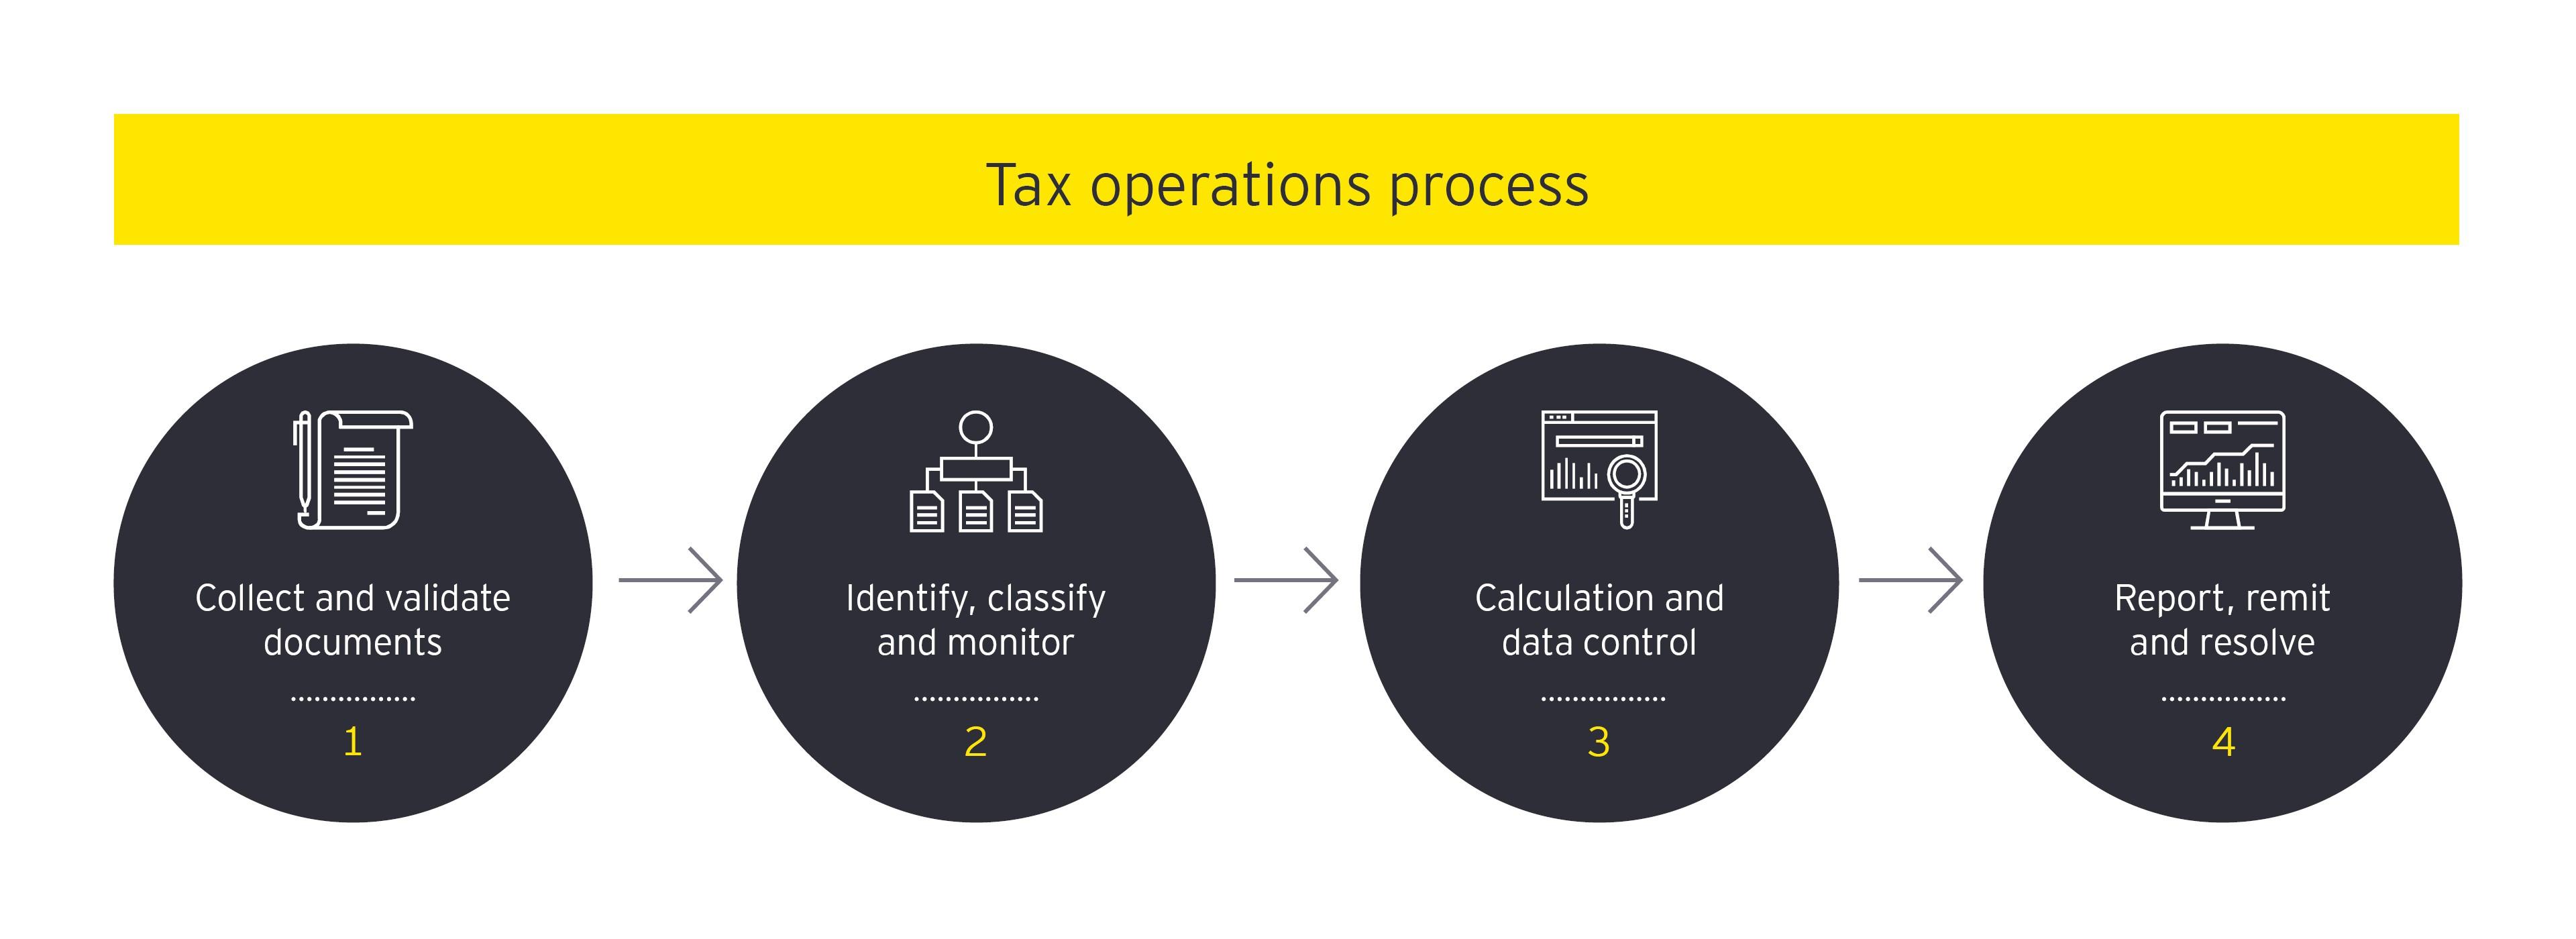 ey-tax-operation-process